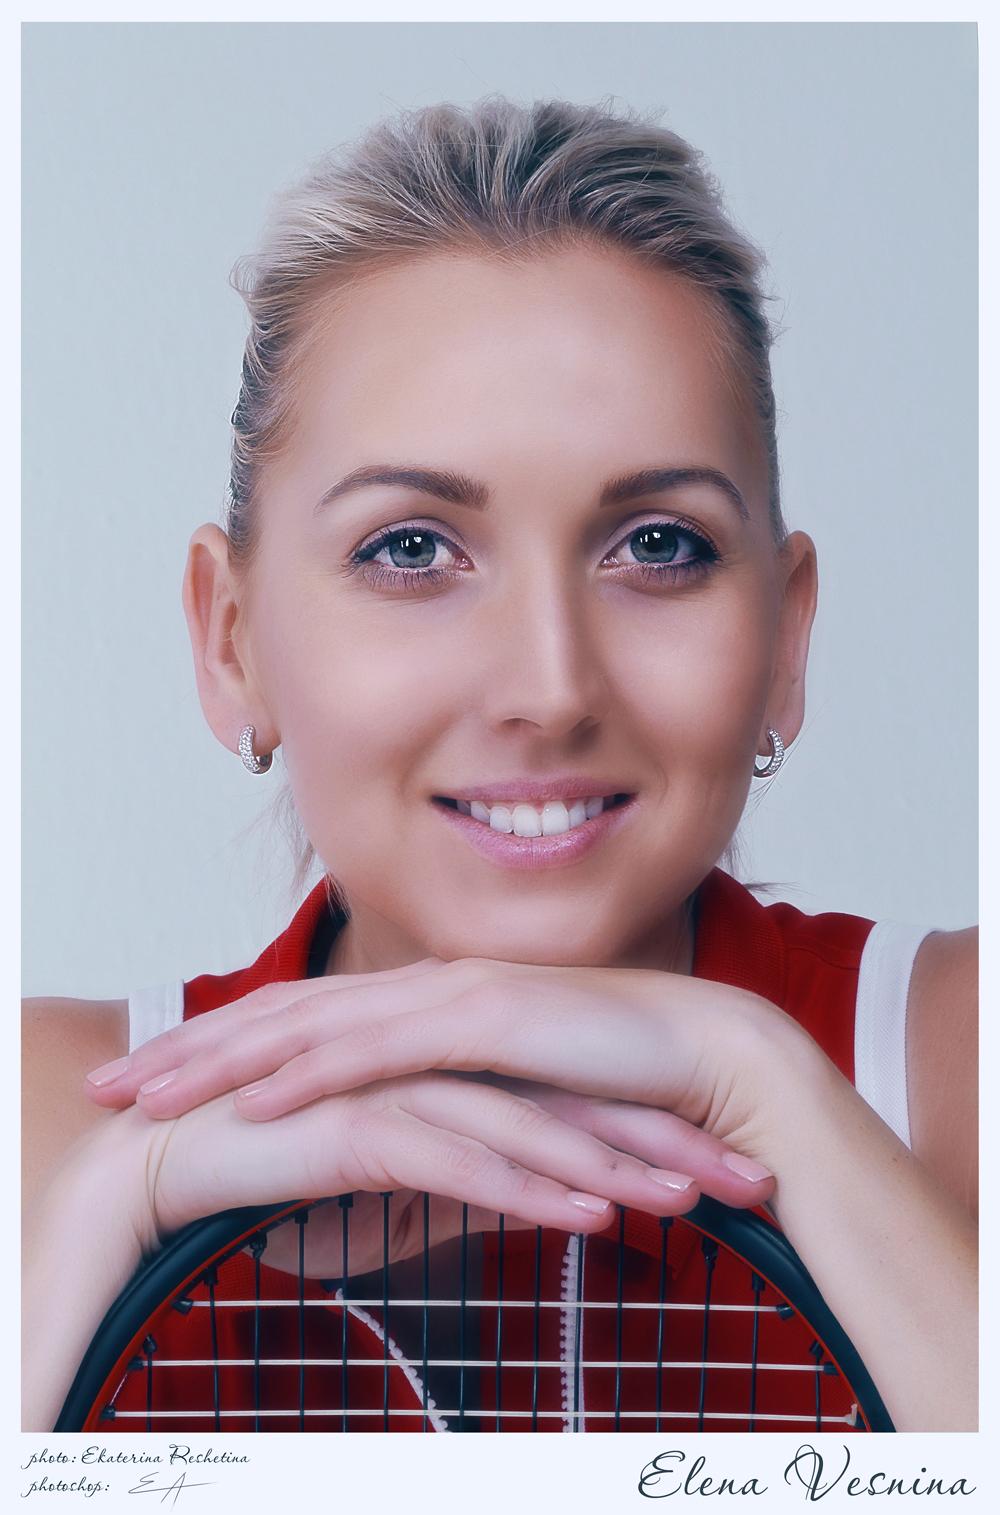 Елена Веснина.